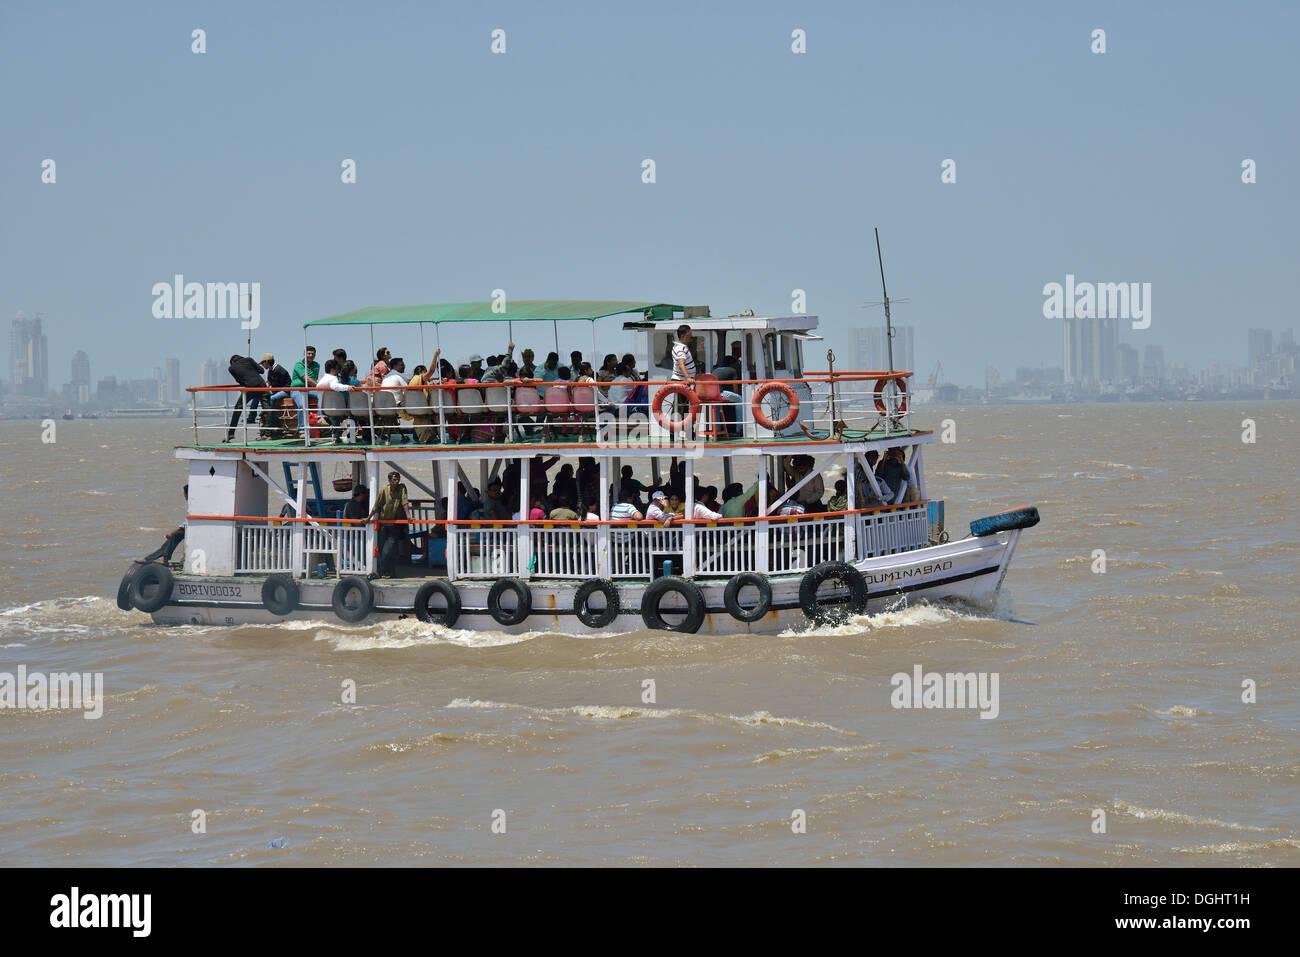 Escursione in barca, Mumbai, Maharashtra, India Immagini Stock